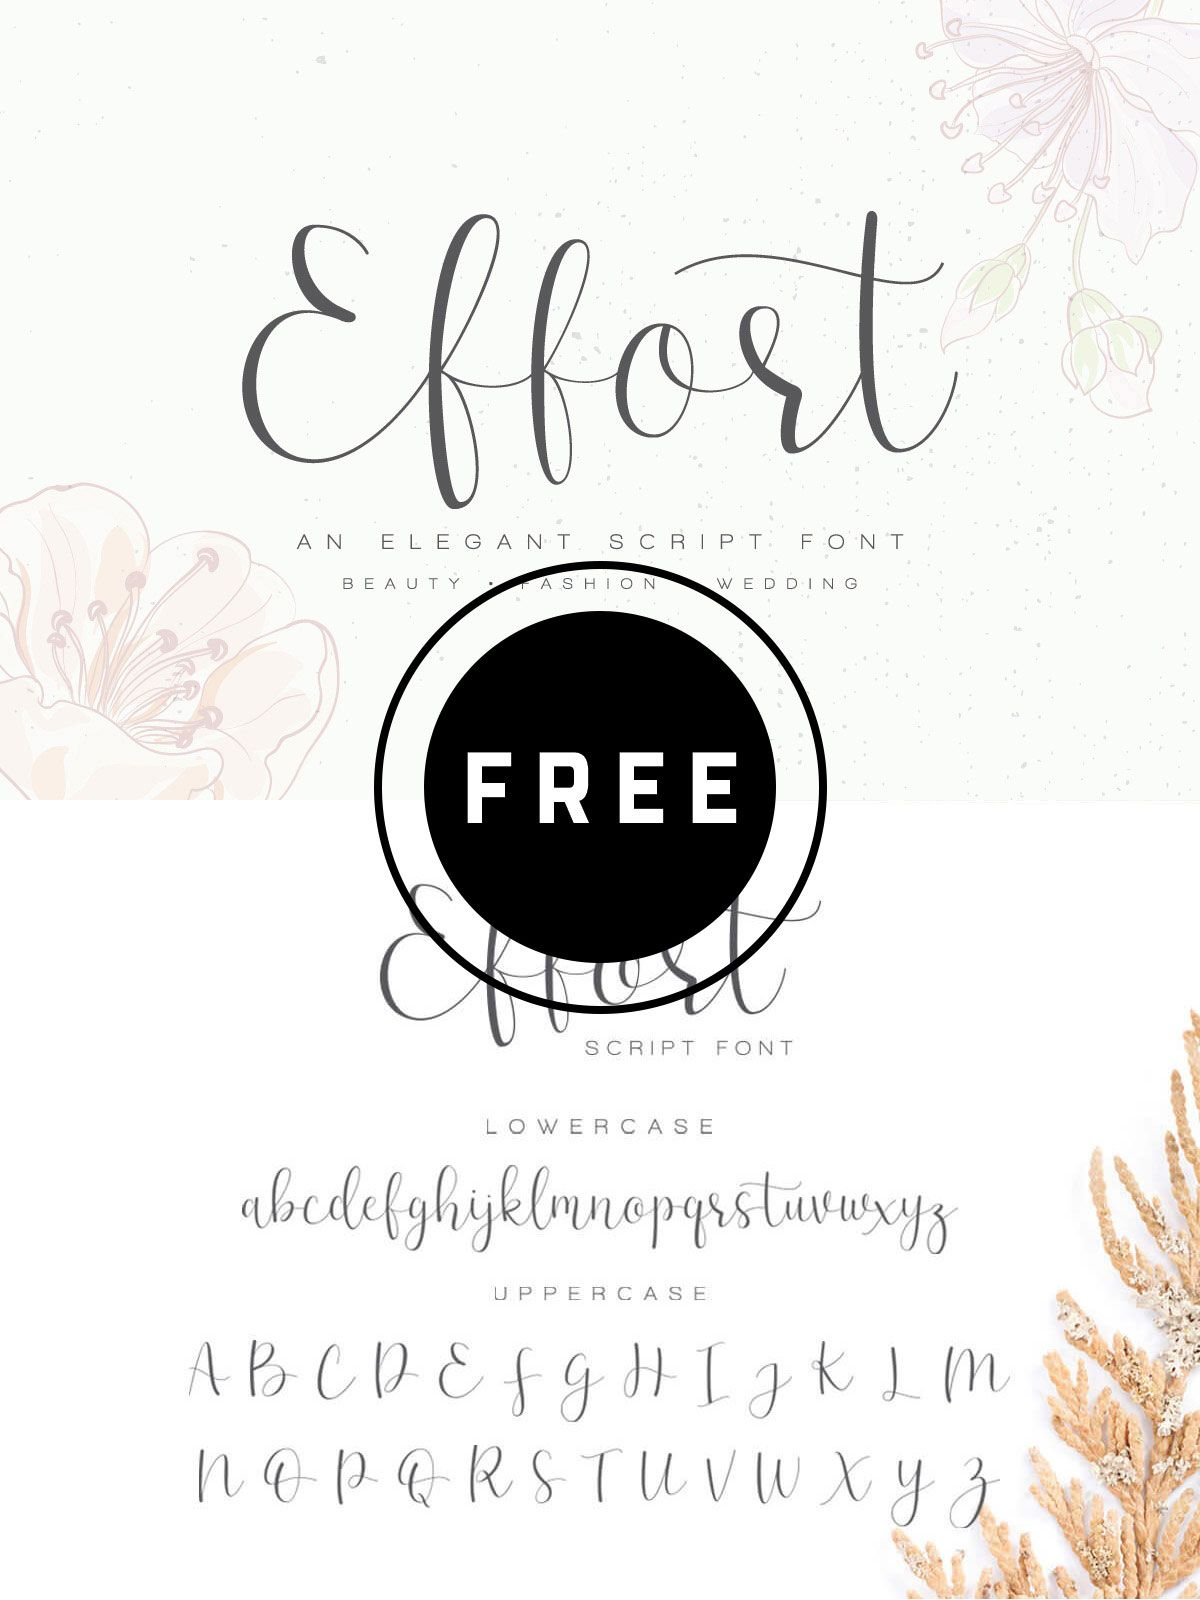 Free Effort Calligraphy Script Font